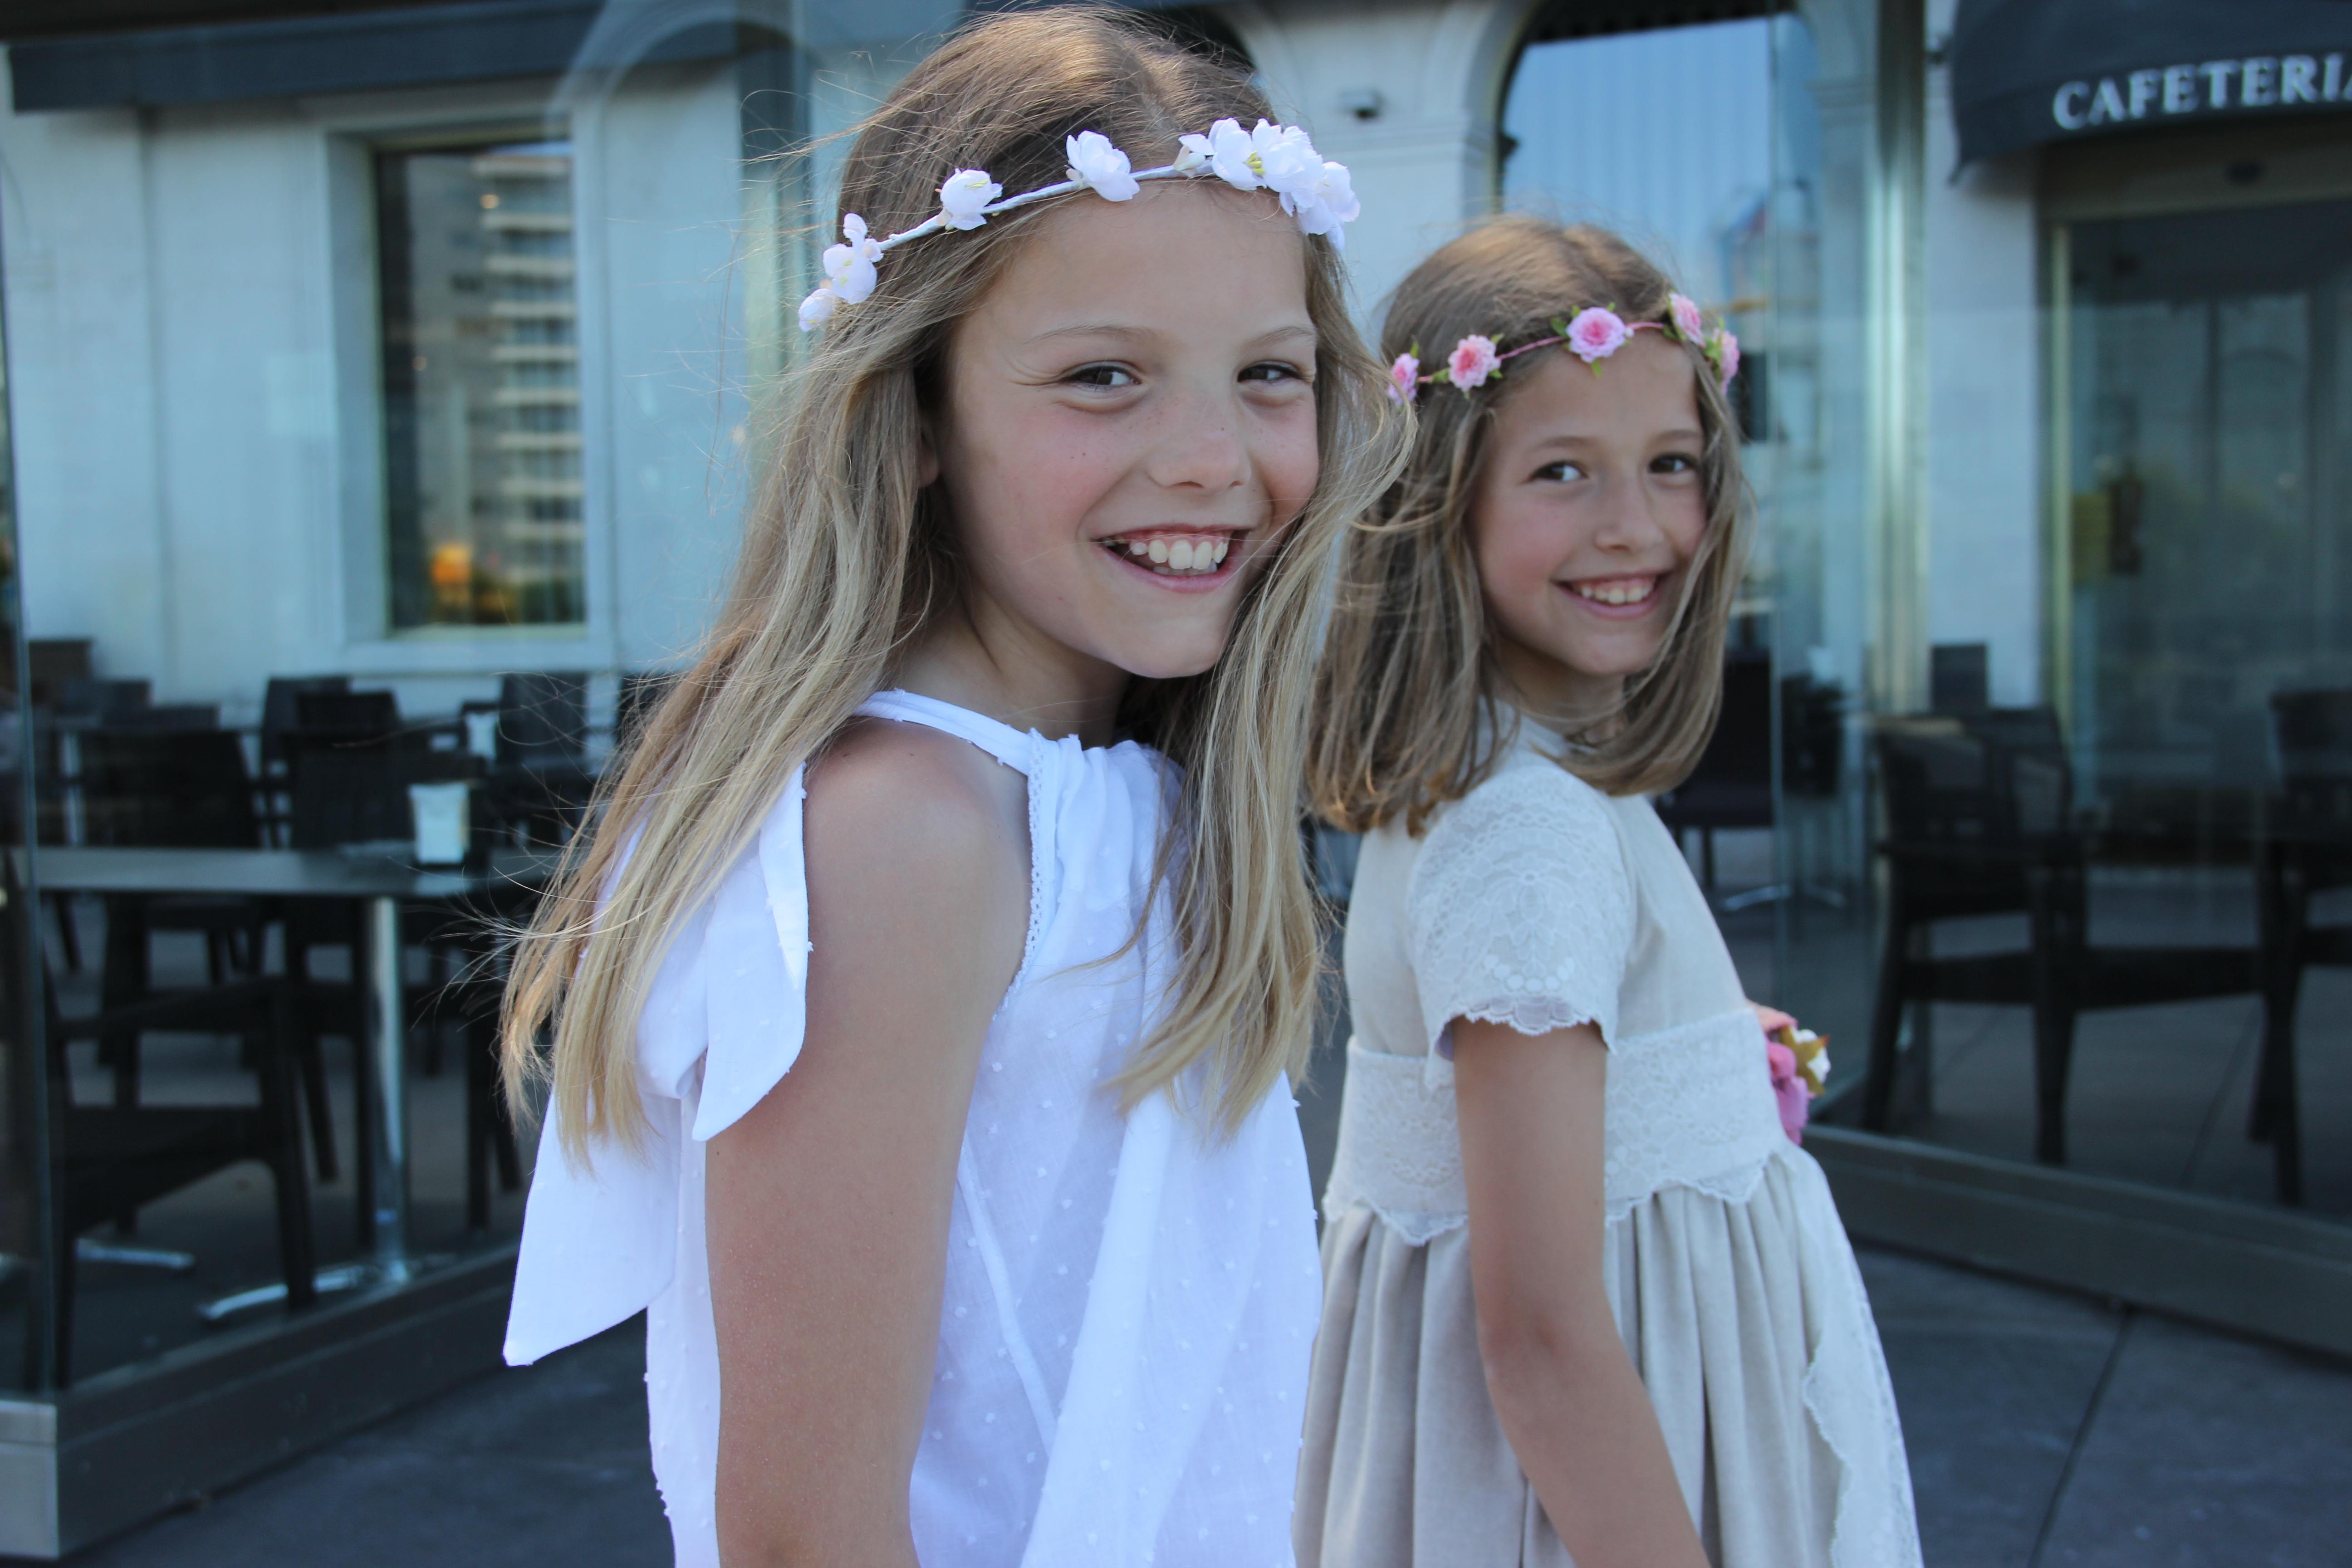 niñas con estilo, moda infantil estilosa,vestido de comunion, comunion 2017, arras online, alta costura niños, ropa de ceremonia infantil a medida, ceremonia infantil (13)